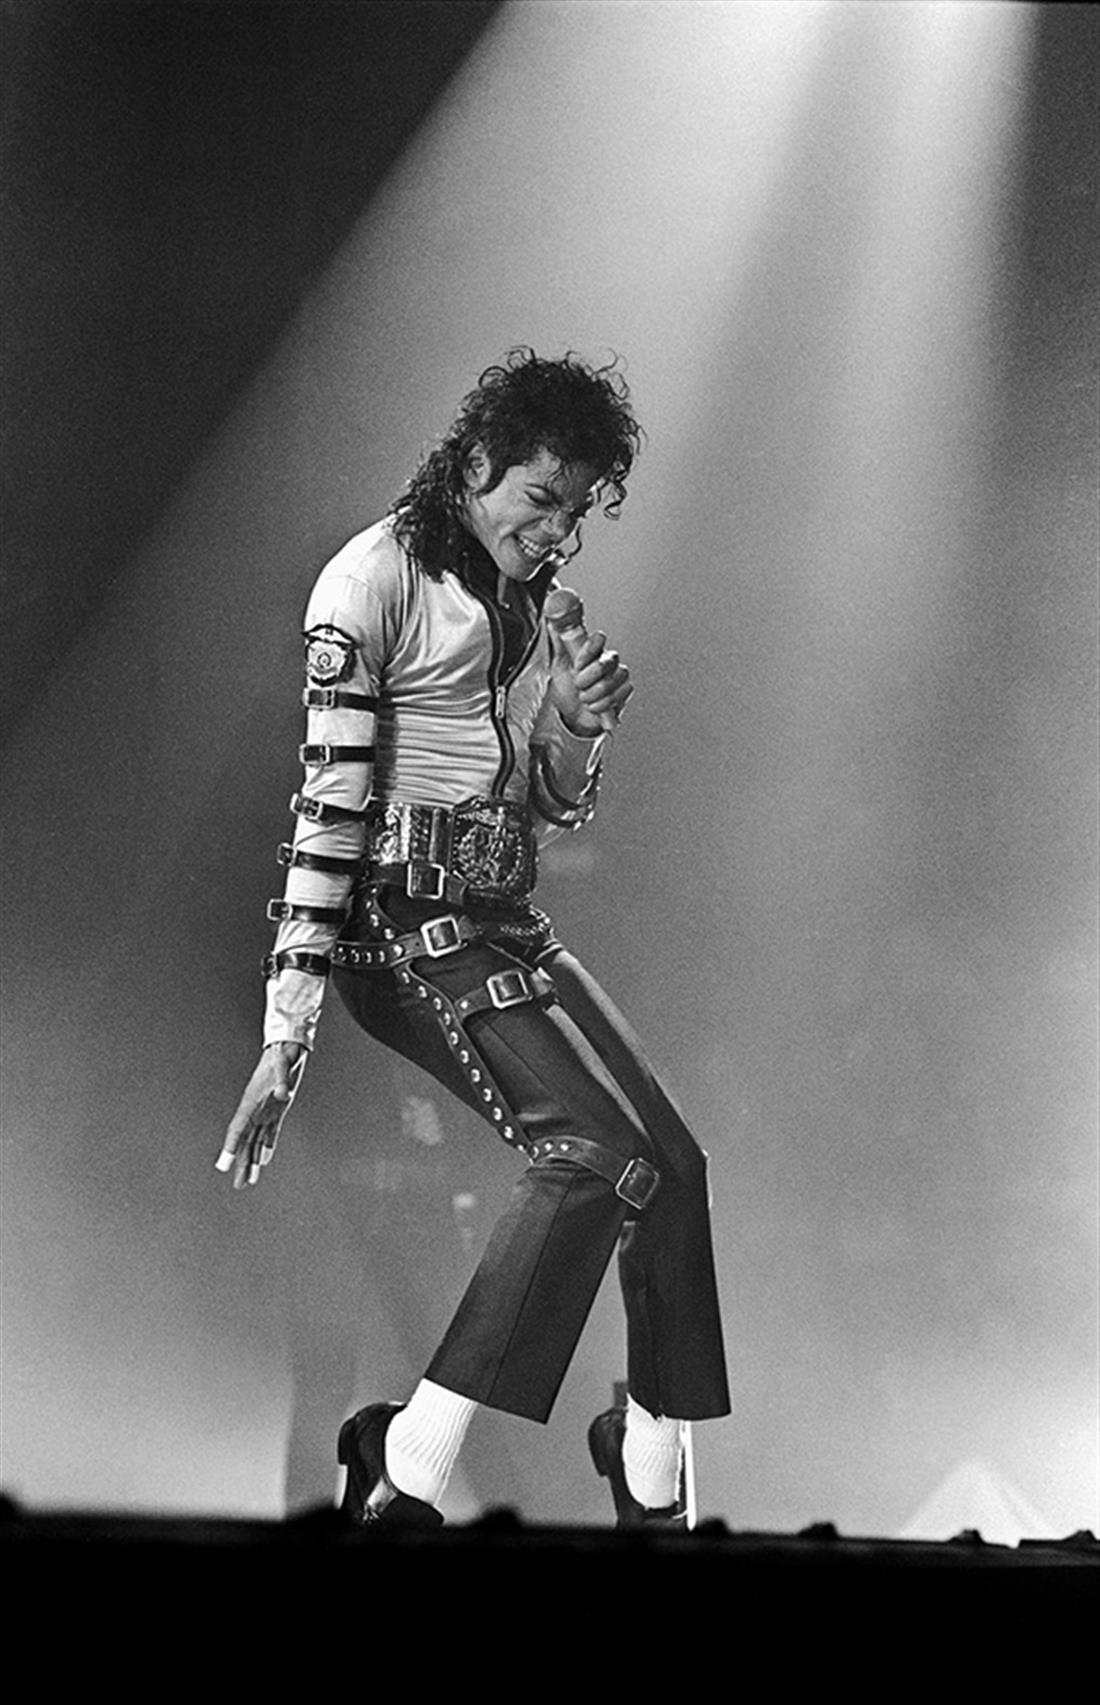 Michael Jackson - Μάικλ Τζάκσον